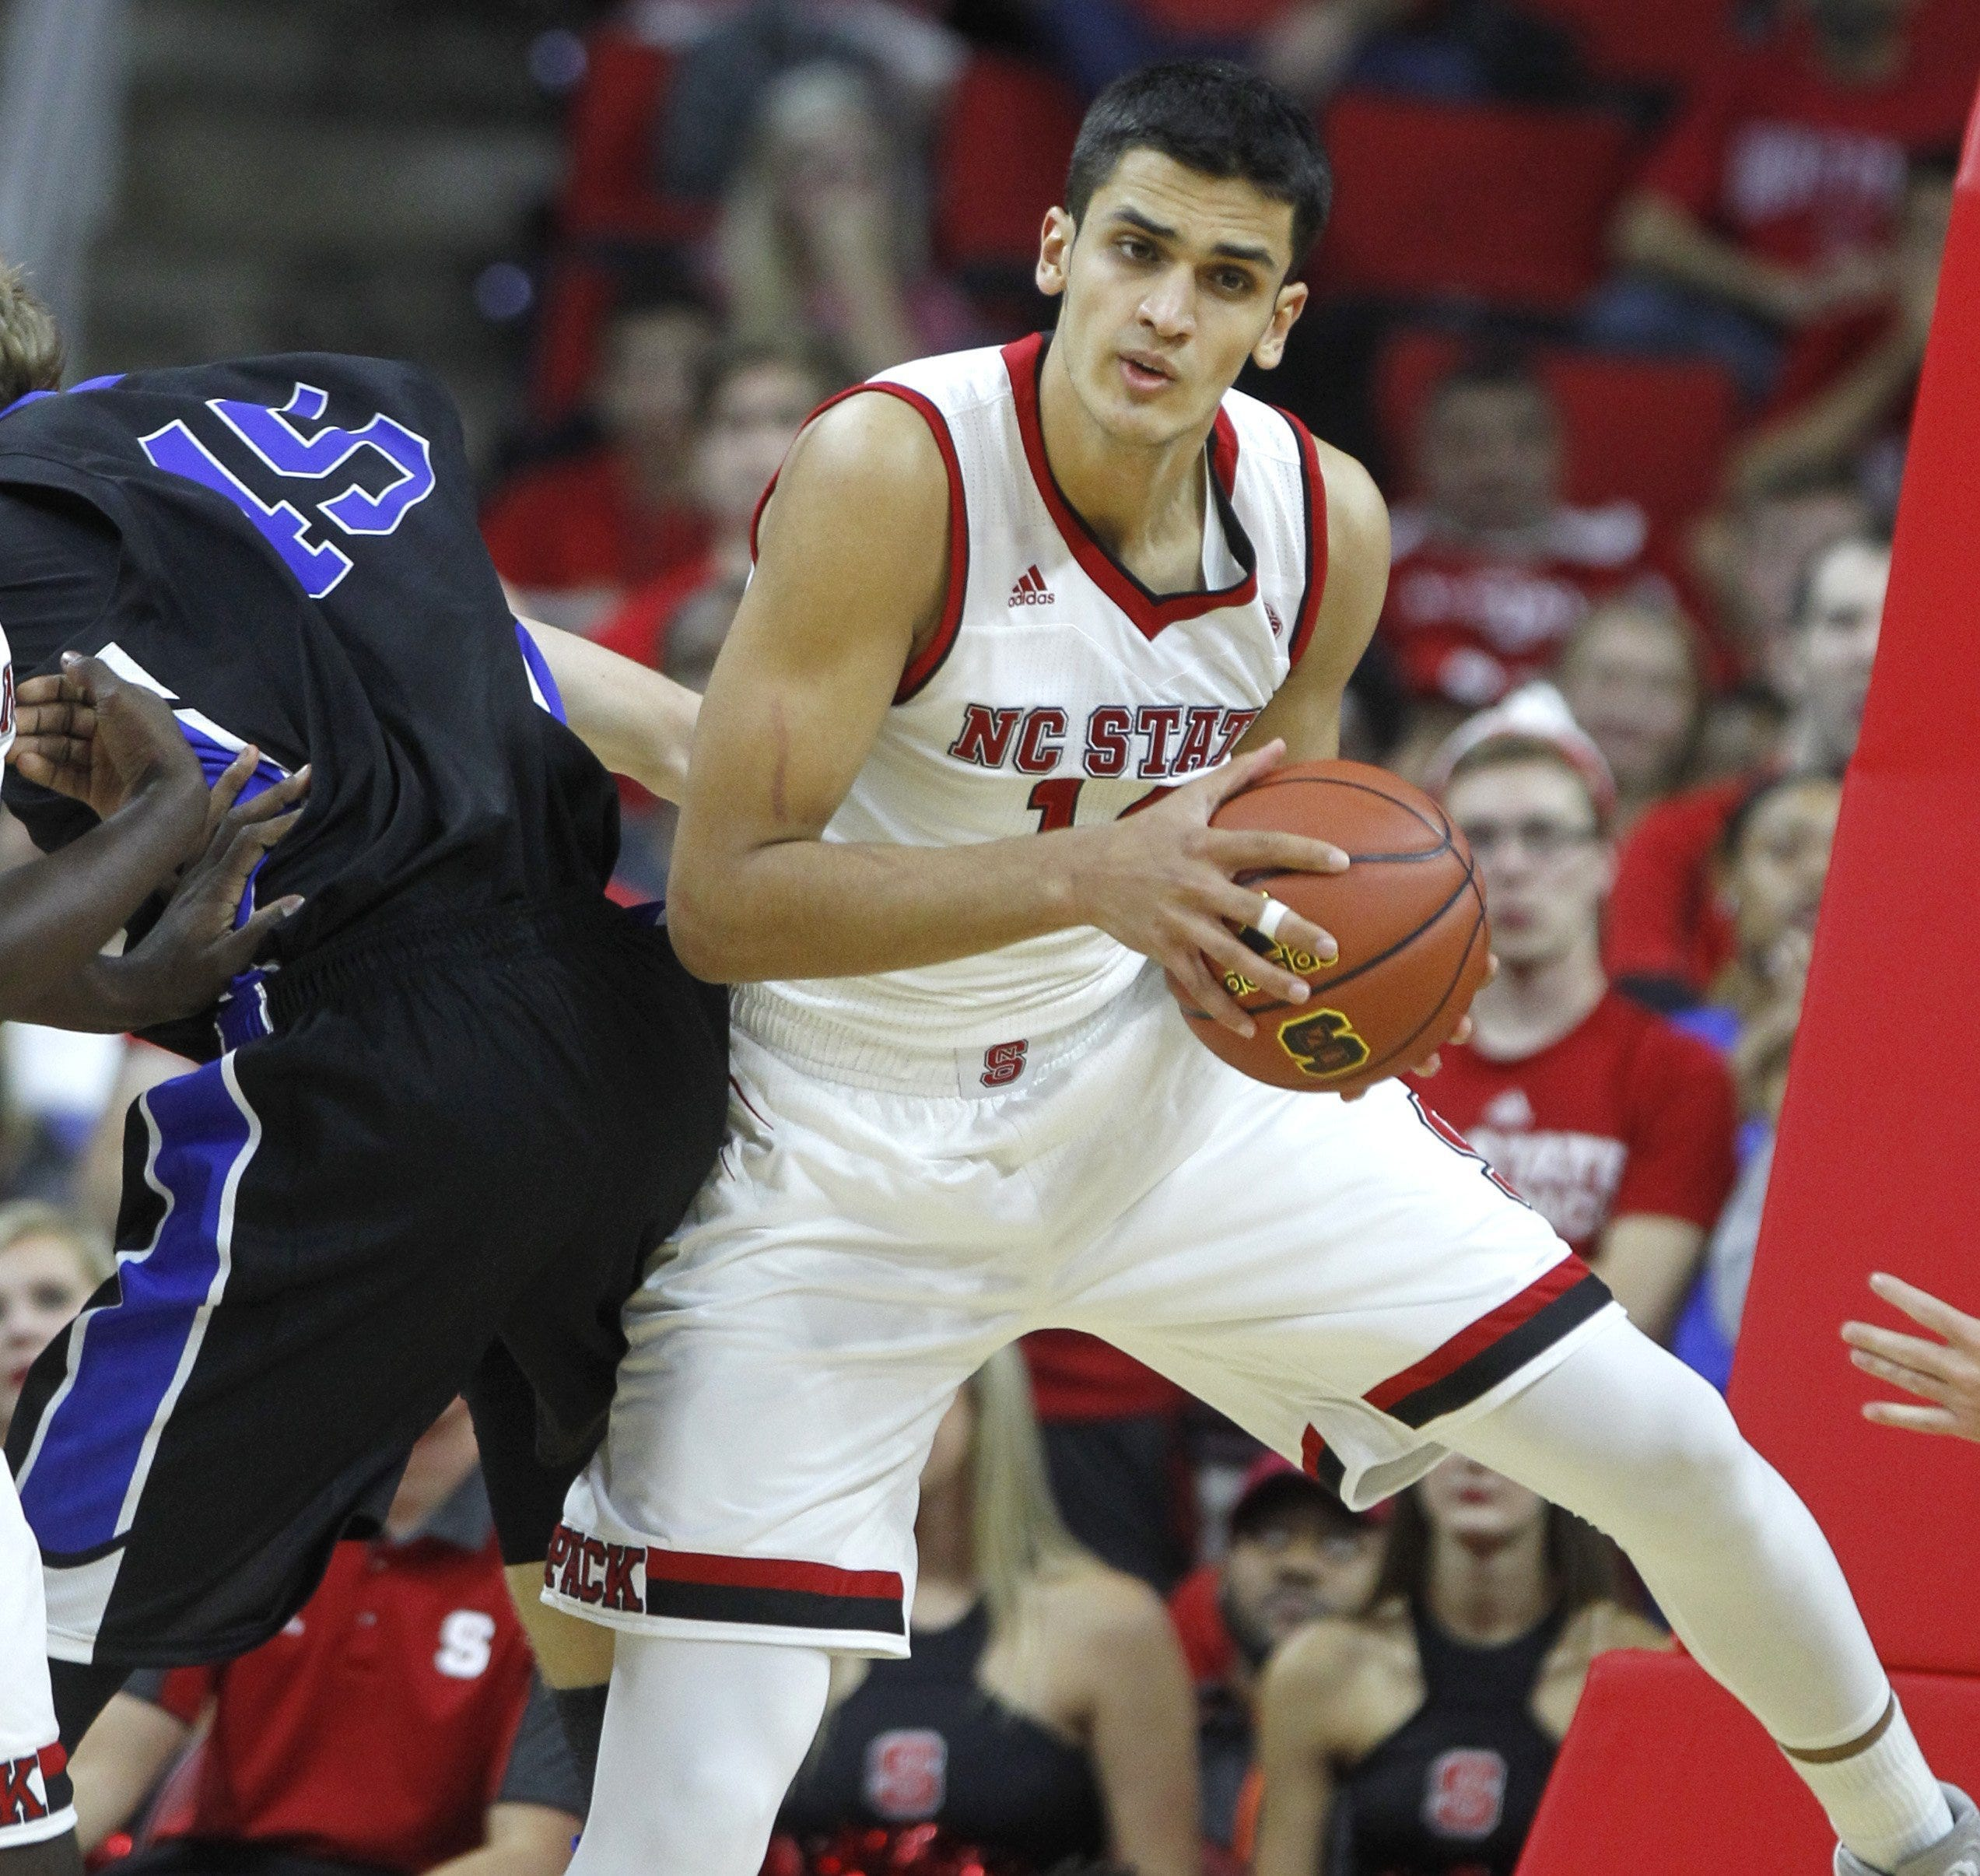 Georgetown adding North Carolina State transfer Omer Yurtseven